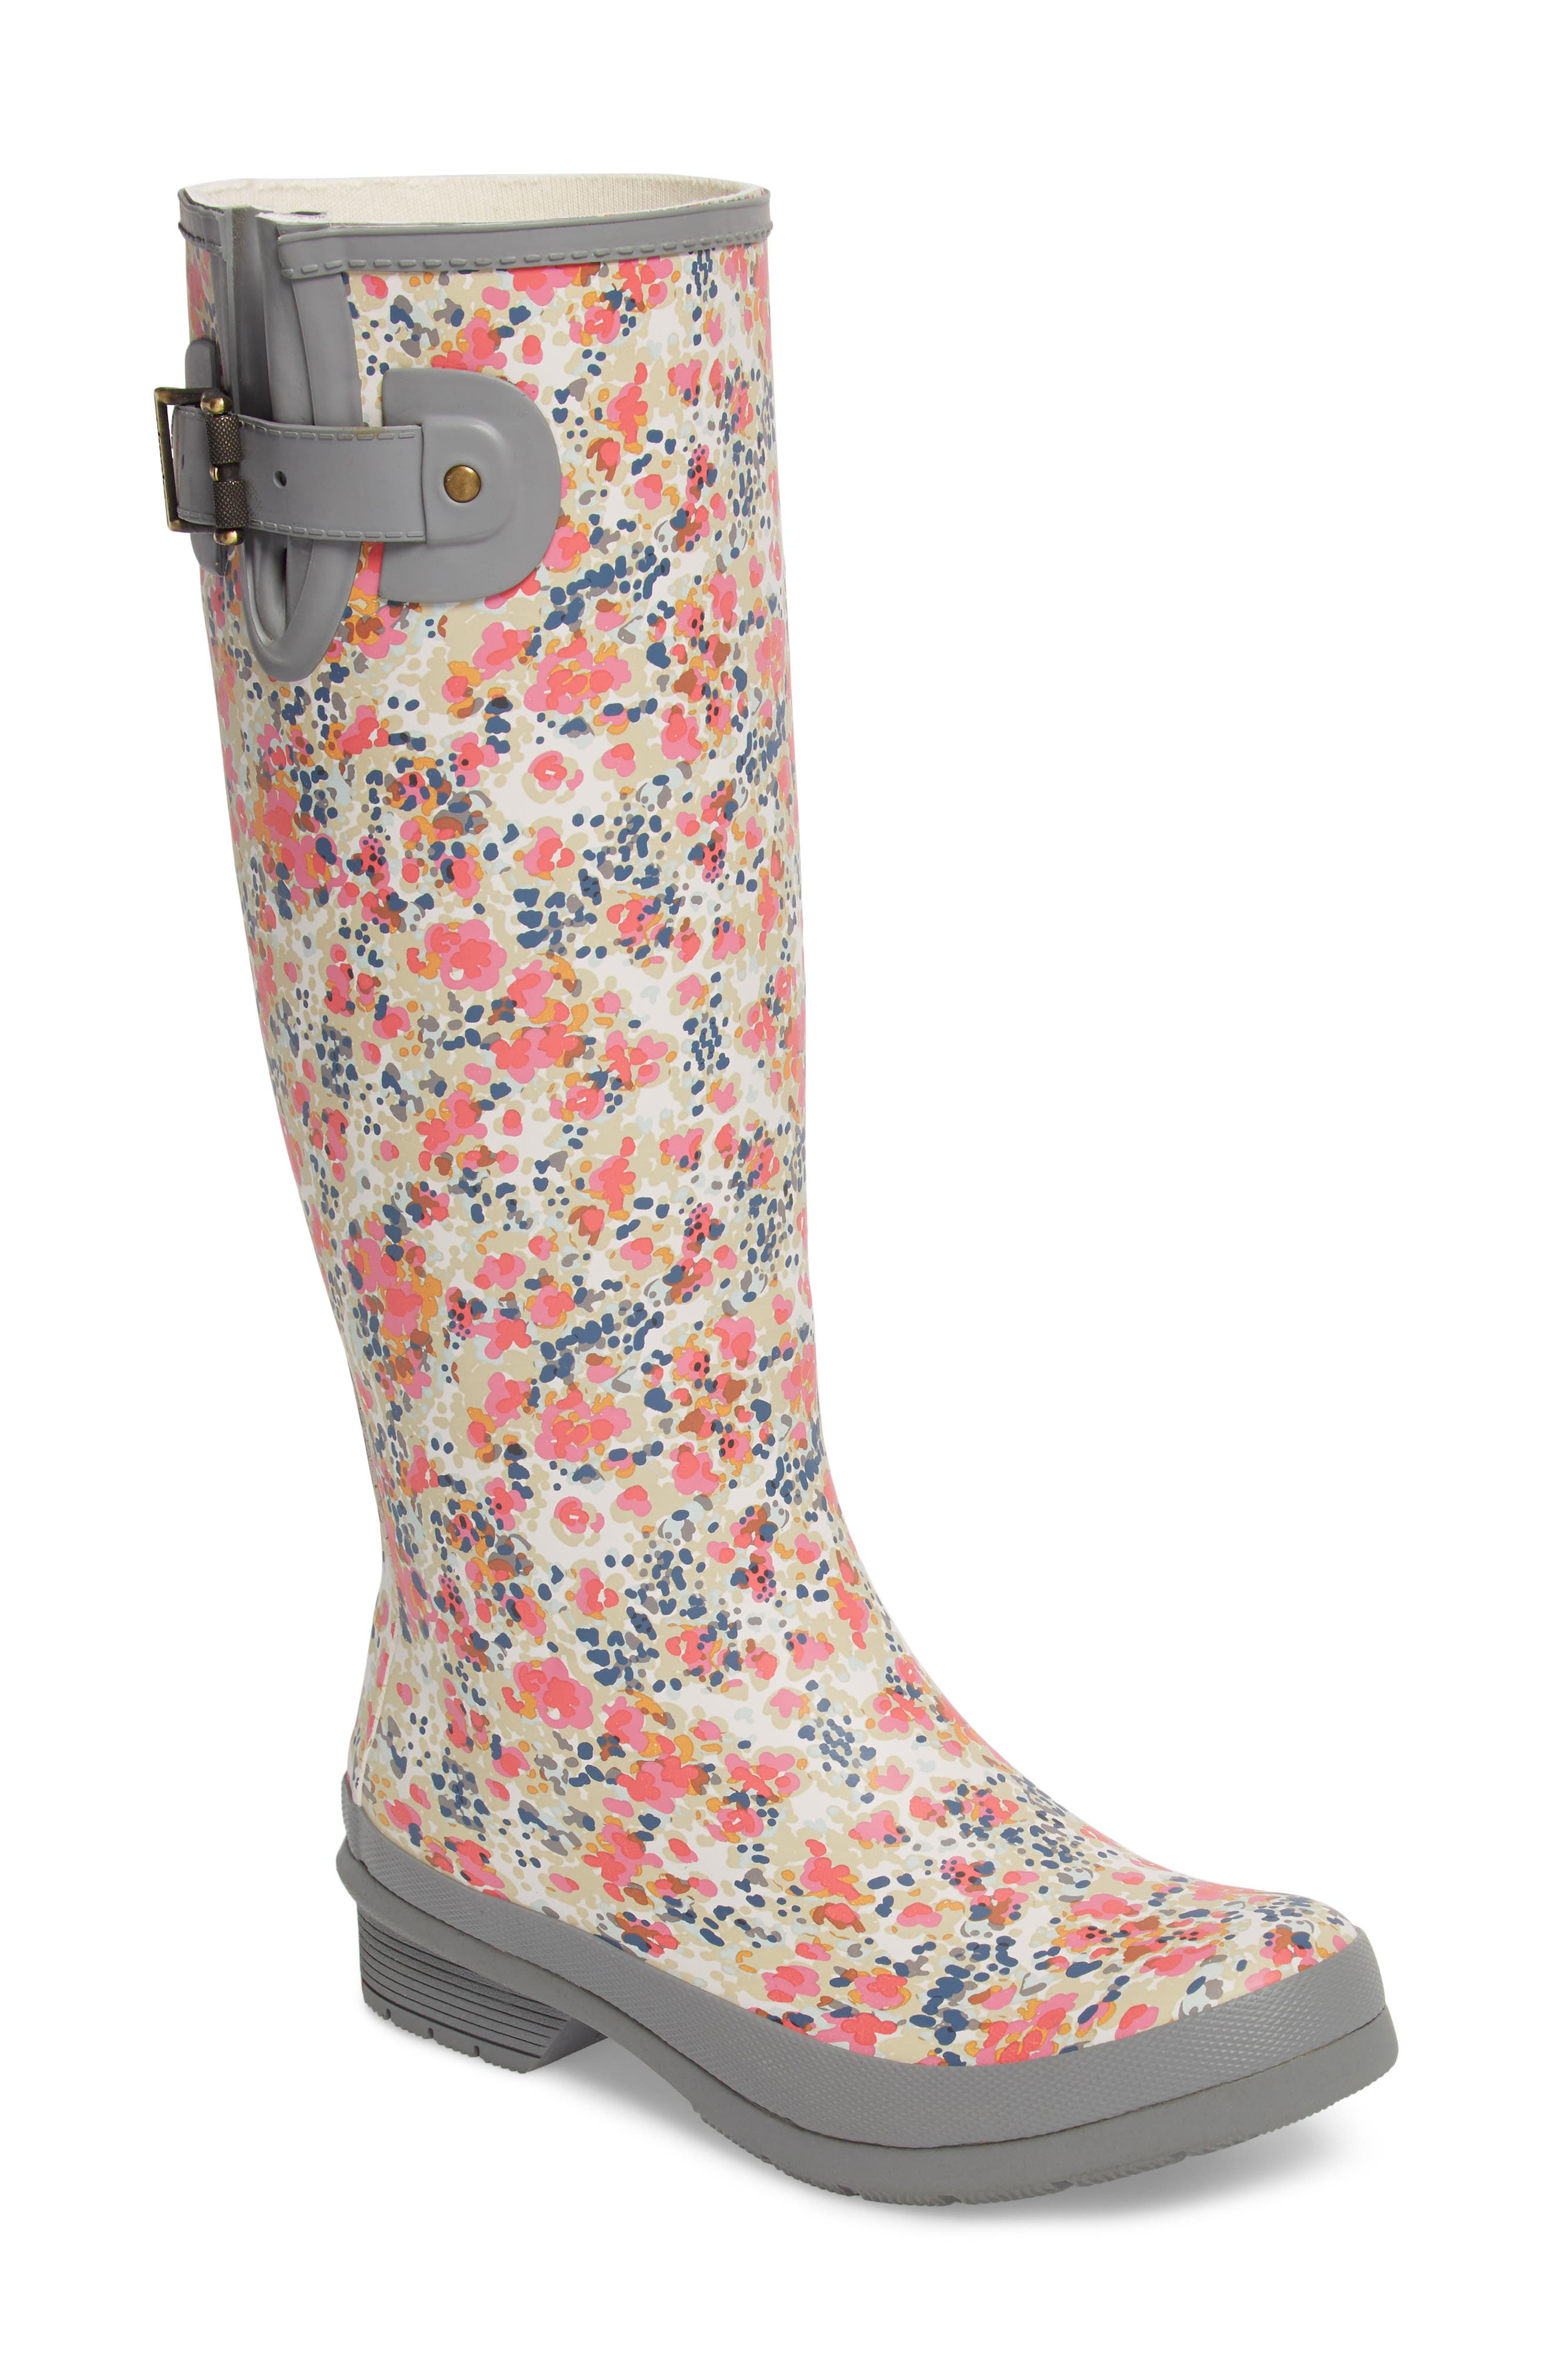 Julia Floral Waterproof Rain Boot,                             Main thumbnail 1, color,                             GRAY